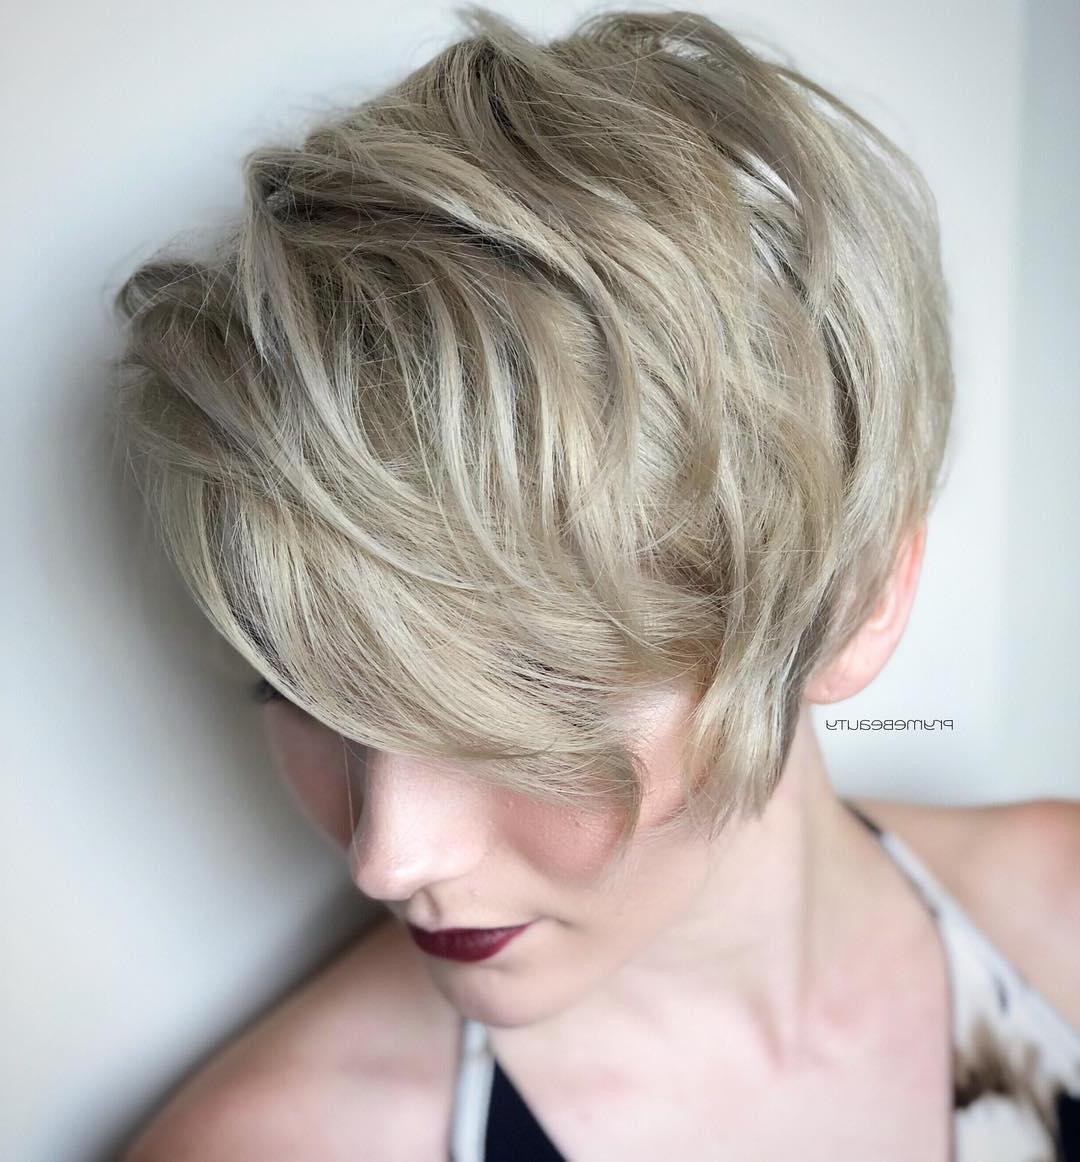 Top 10 Trendy, Low Maintenance Short Layered Hairstyles For 2018 2019 For Long Hairstyles Short Layers (View 13 of 25)